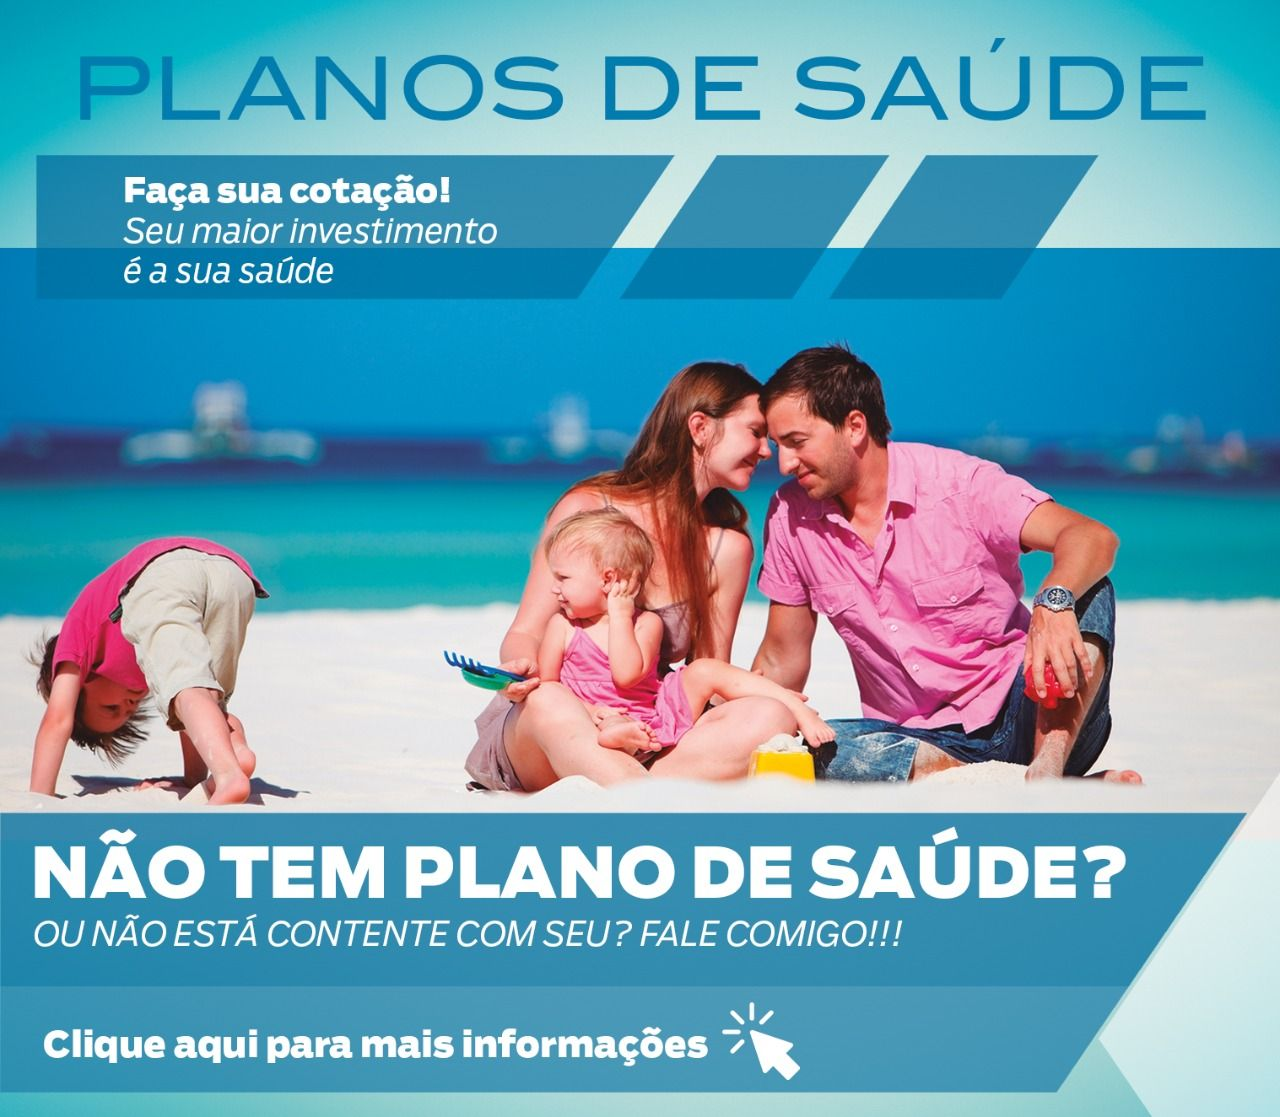 foto Fran - Planos de Saúde